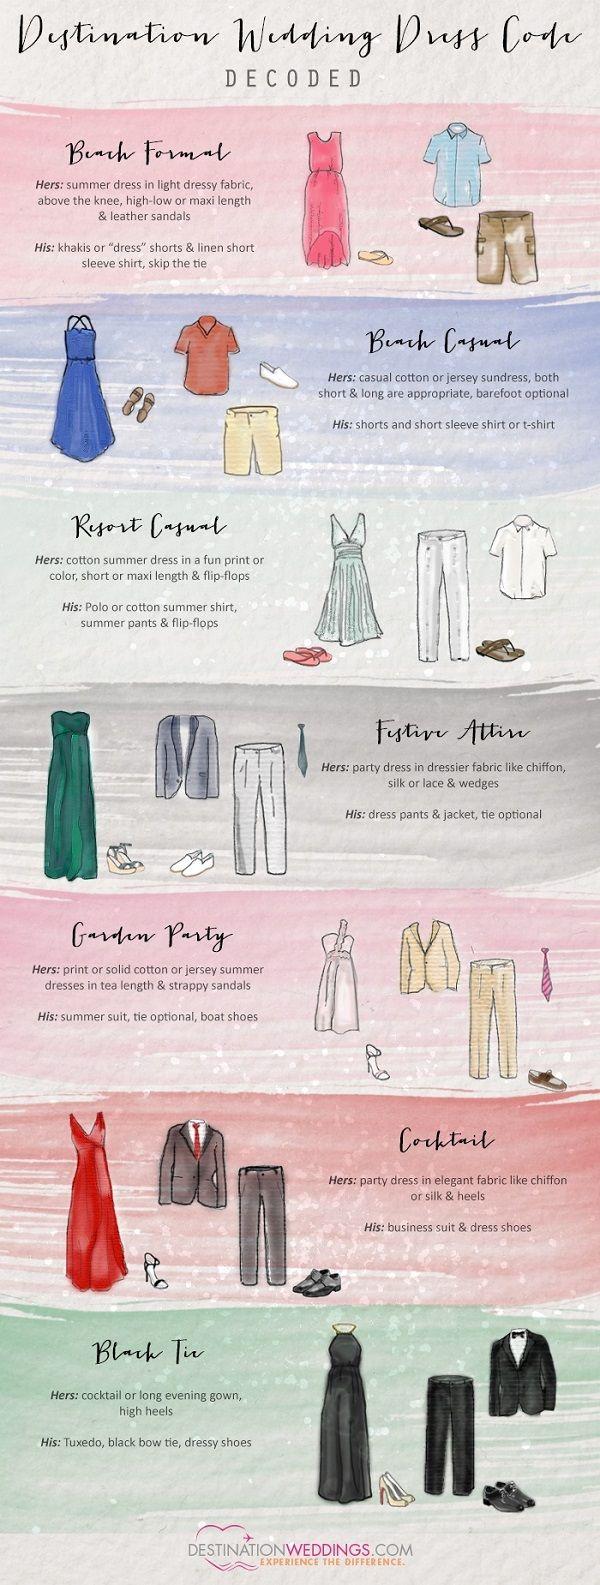 91c41739a74 Destination Wedding-- Dress Code Decoded